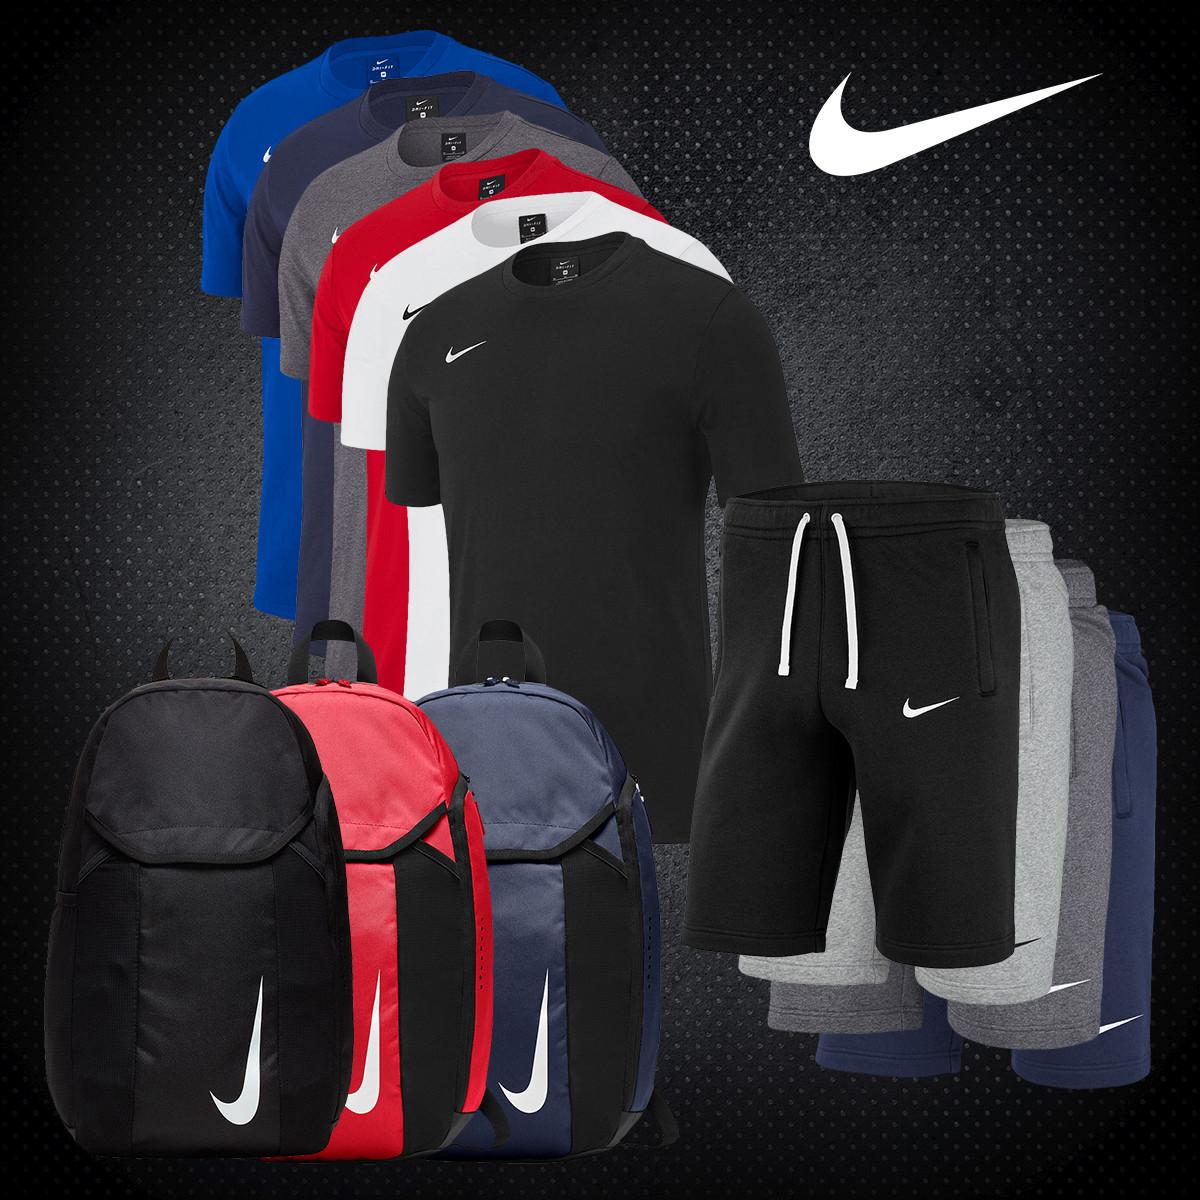 Nike Team Club 3-delige set + gratis verzending t.w.v. €9,95 @ Geomix